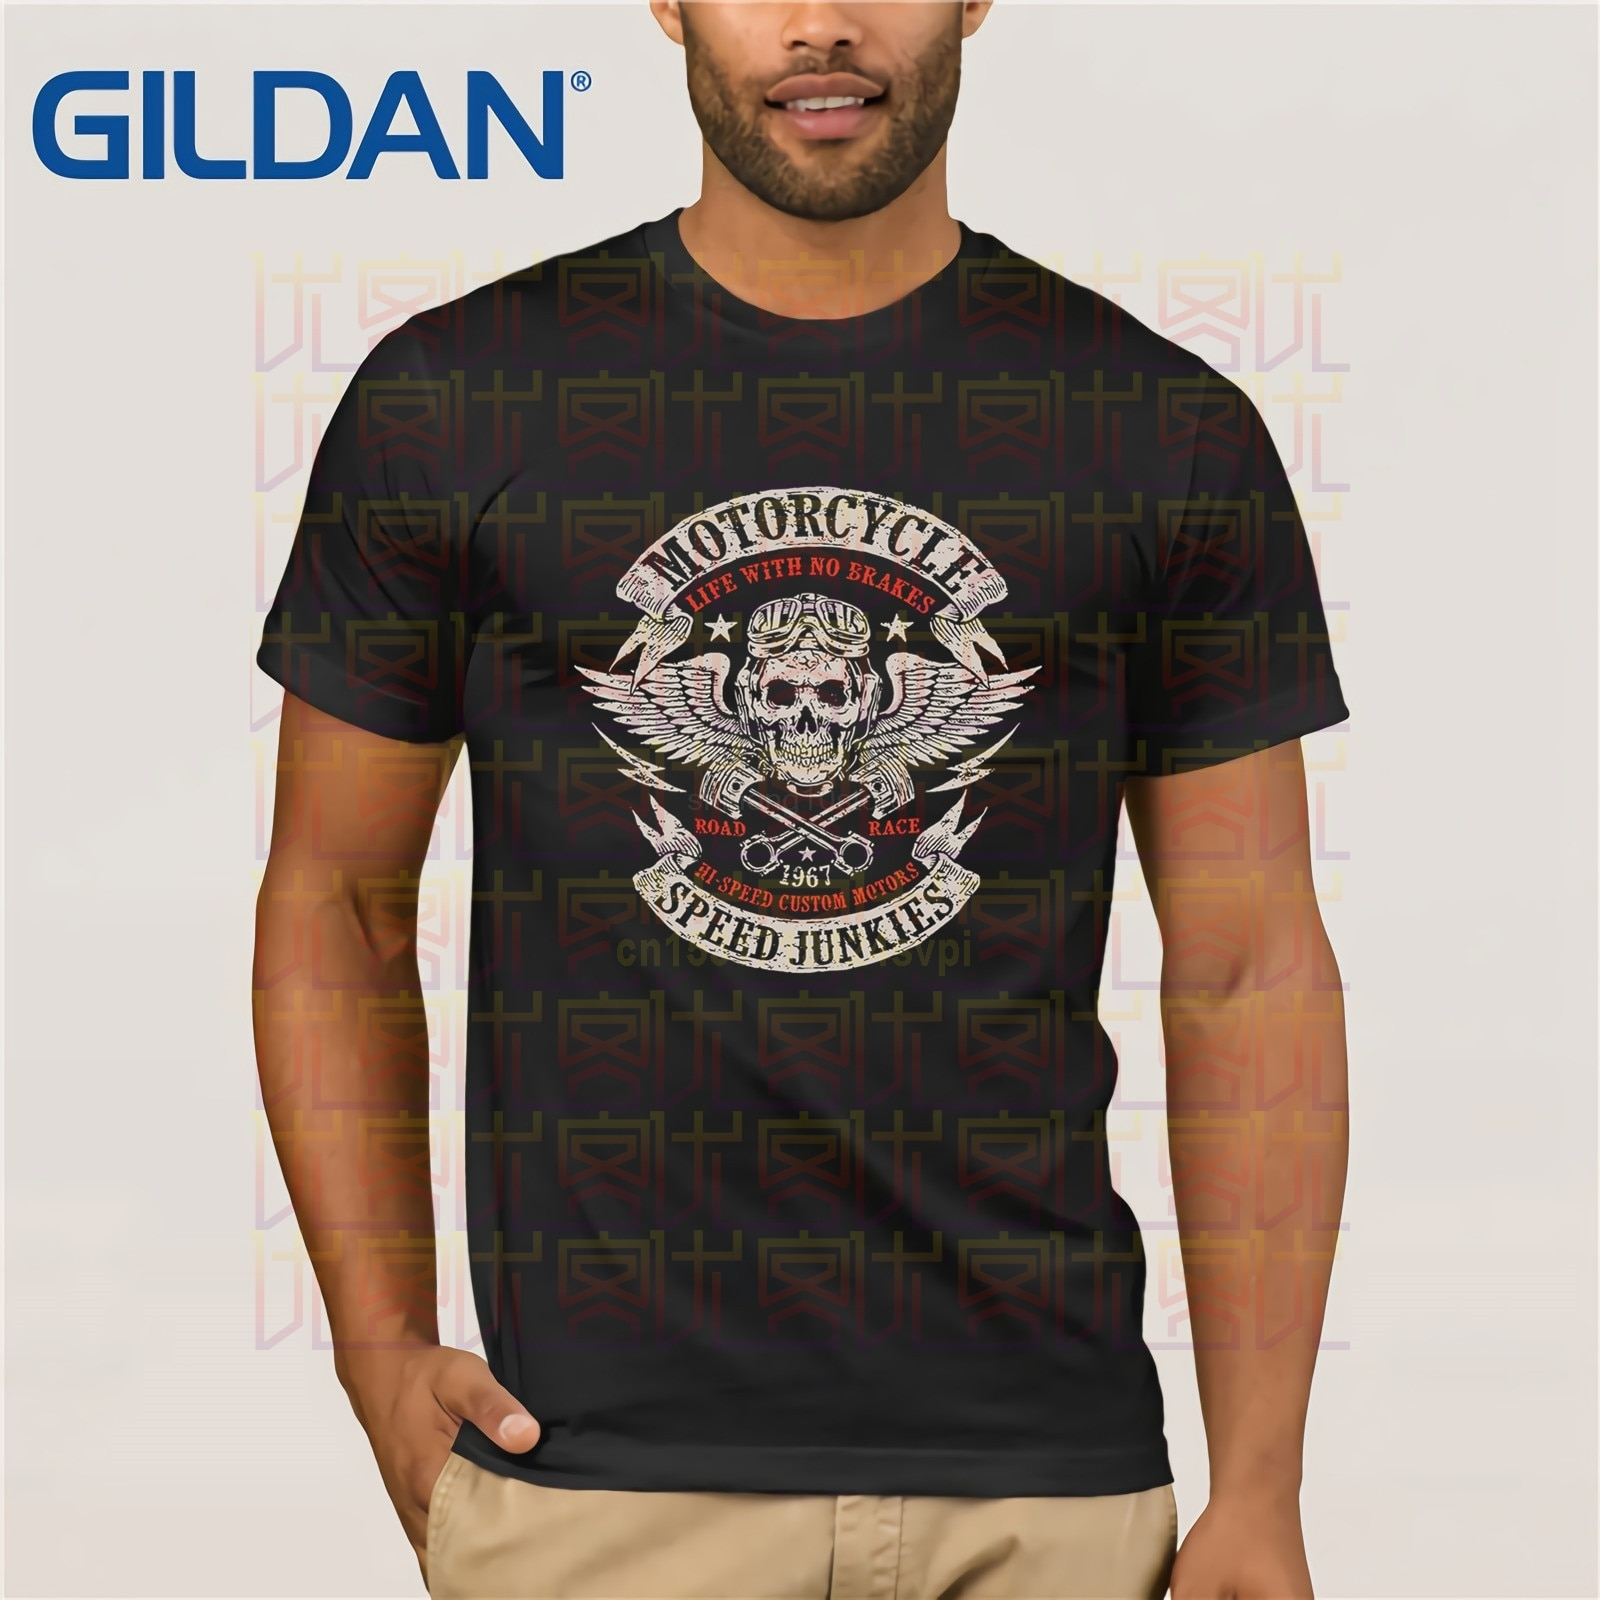 Ropa divertida, pantalón corto Casual, camisetas de manga corta, camisetas de velocidad para motociclistas, camisetas Mc Chopper Motard